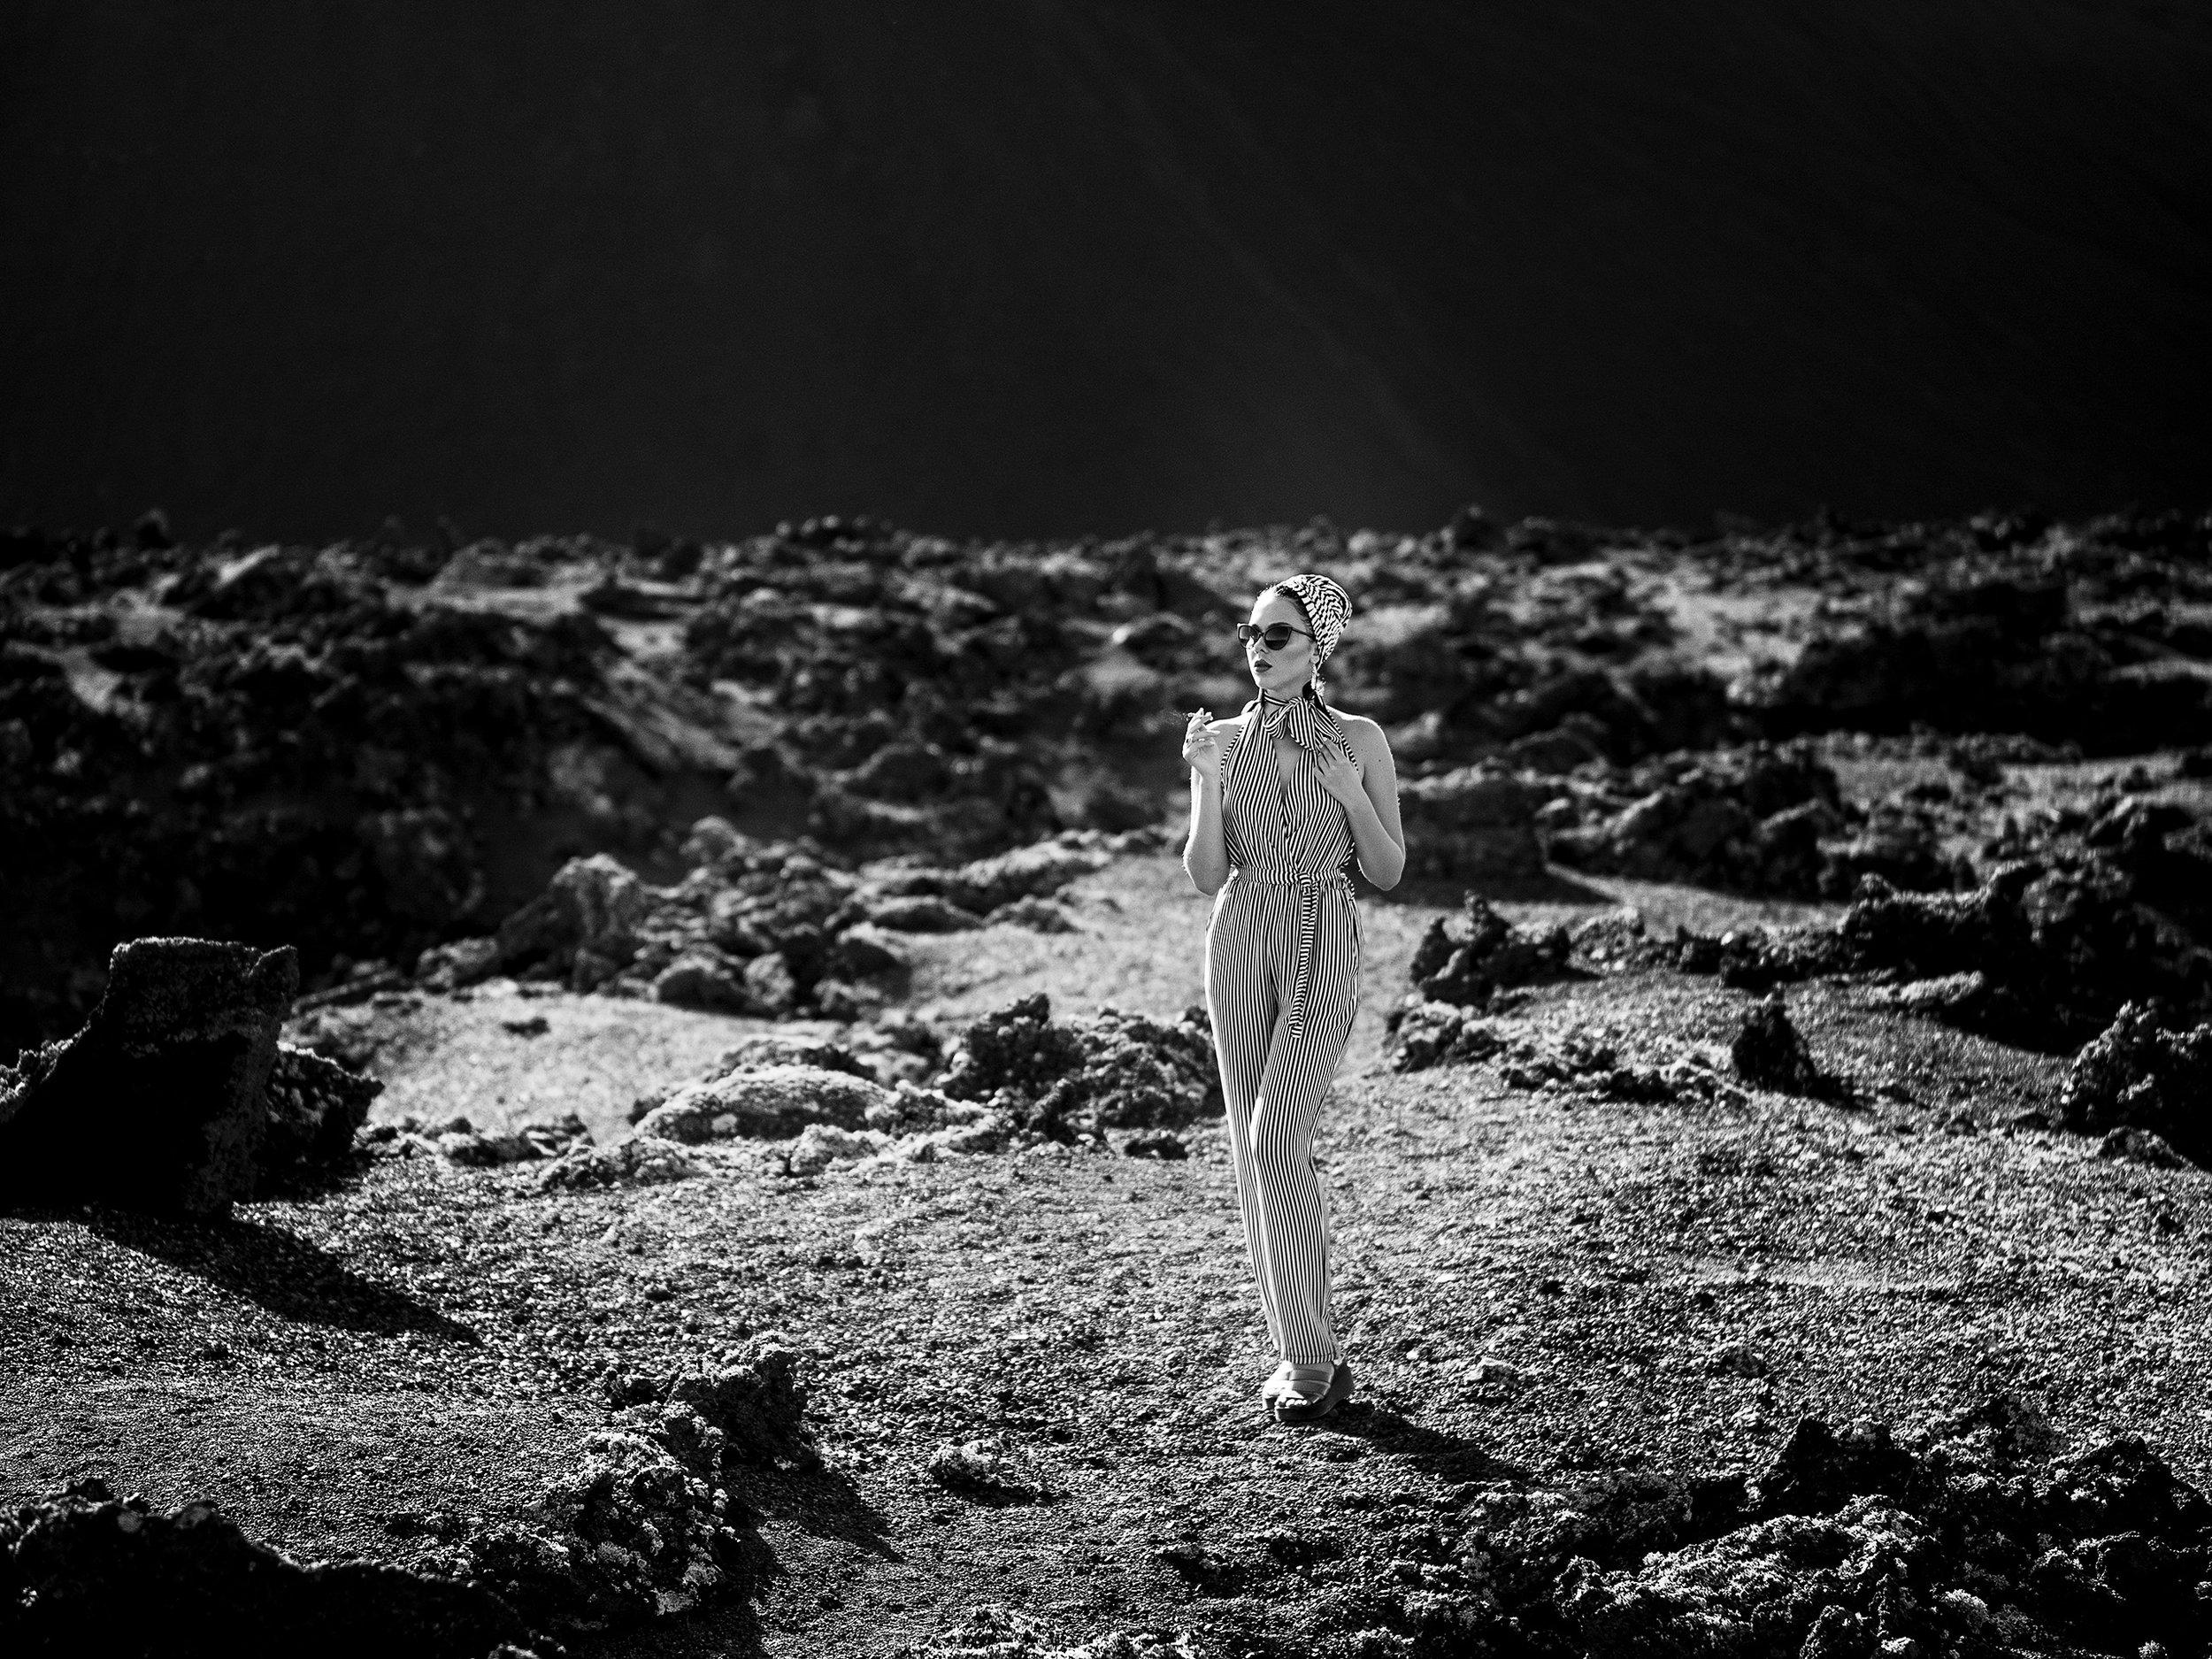 Olga Maria Veide by Eric Berger - LIK Fotoevent Lanzarote 2017